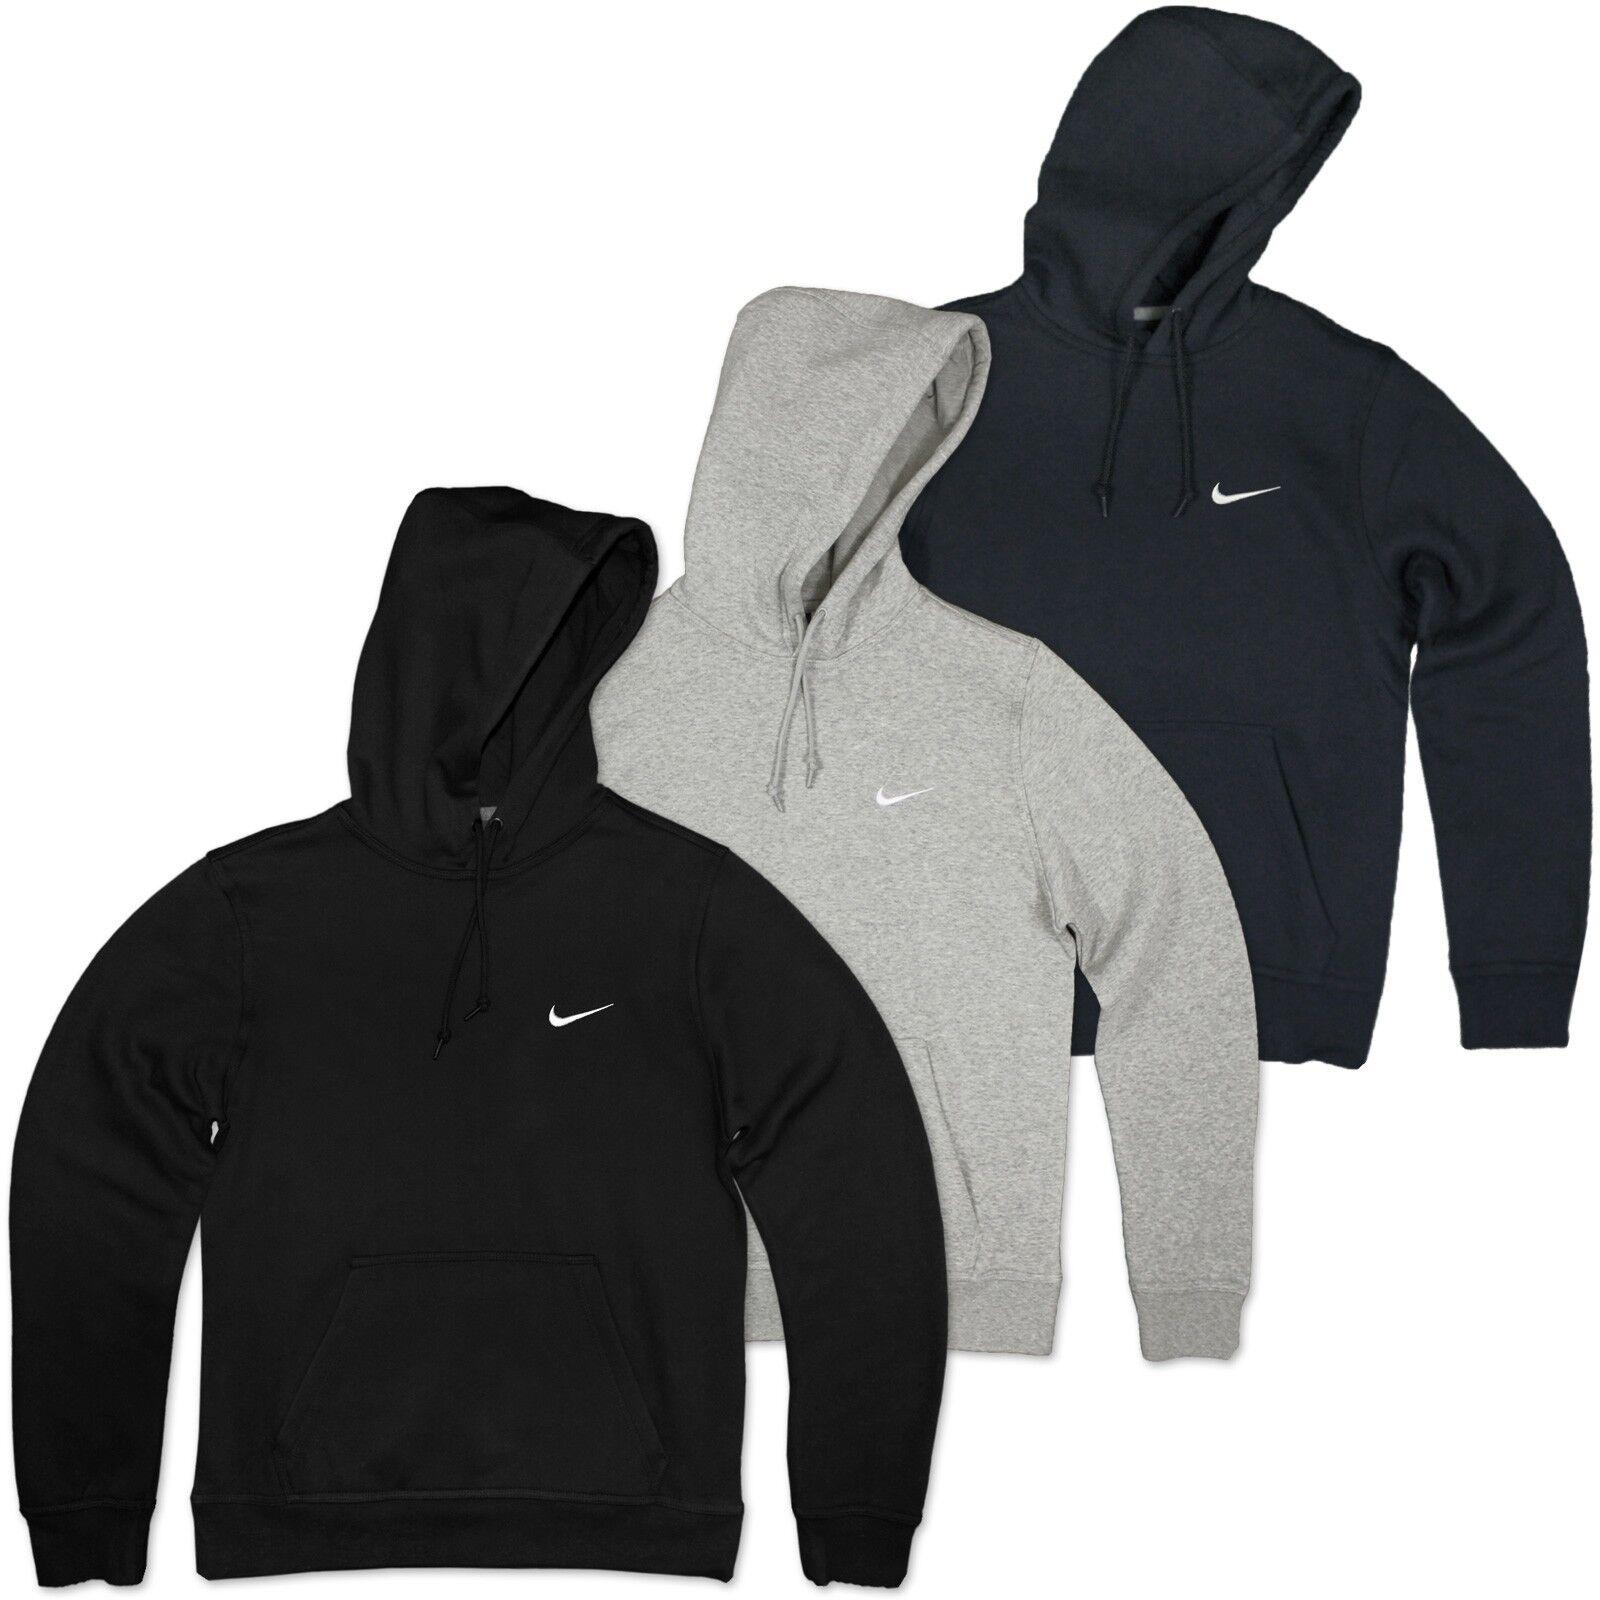 Nike Swoosh Swoosh Swoosh Felpa con Cappuccio Pile Pullover Club Sweatshirt Sweater S-XL 735cd2